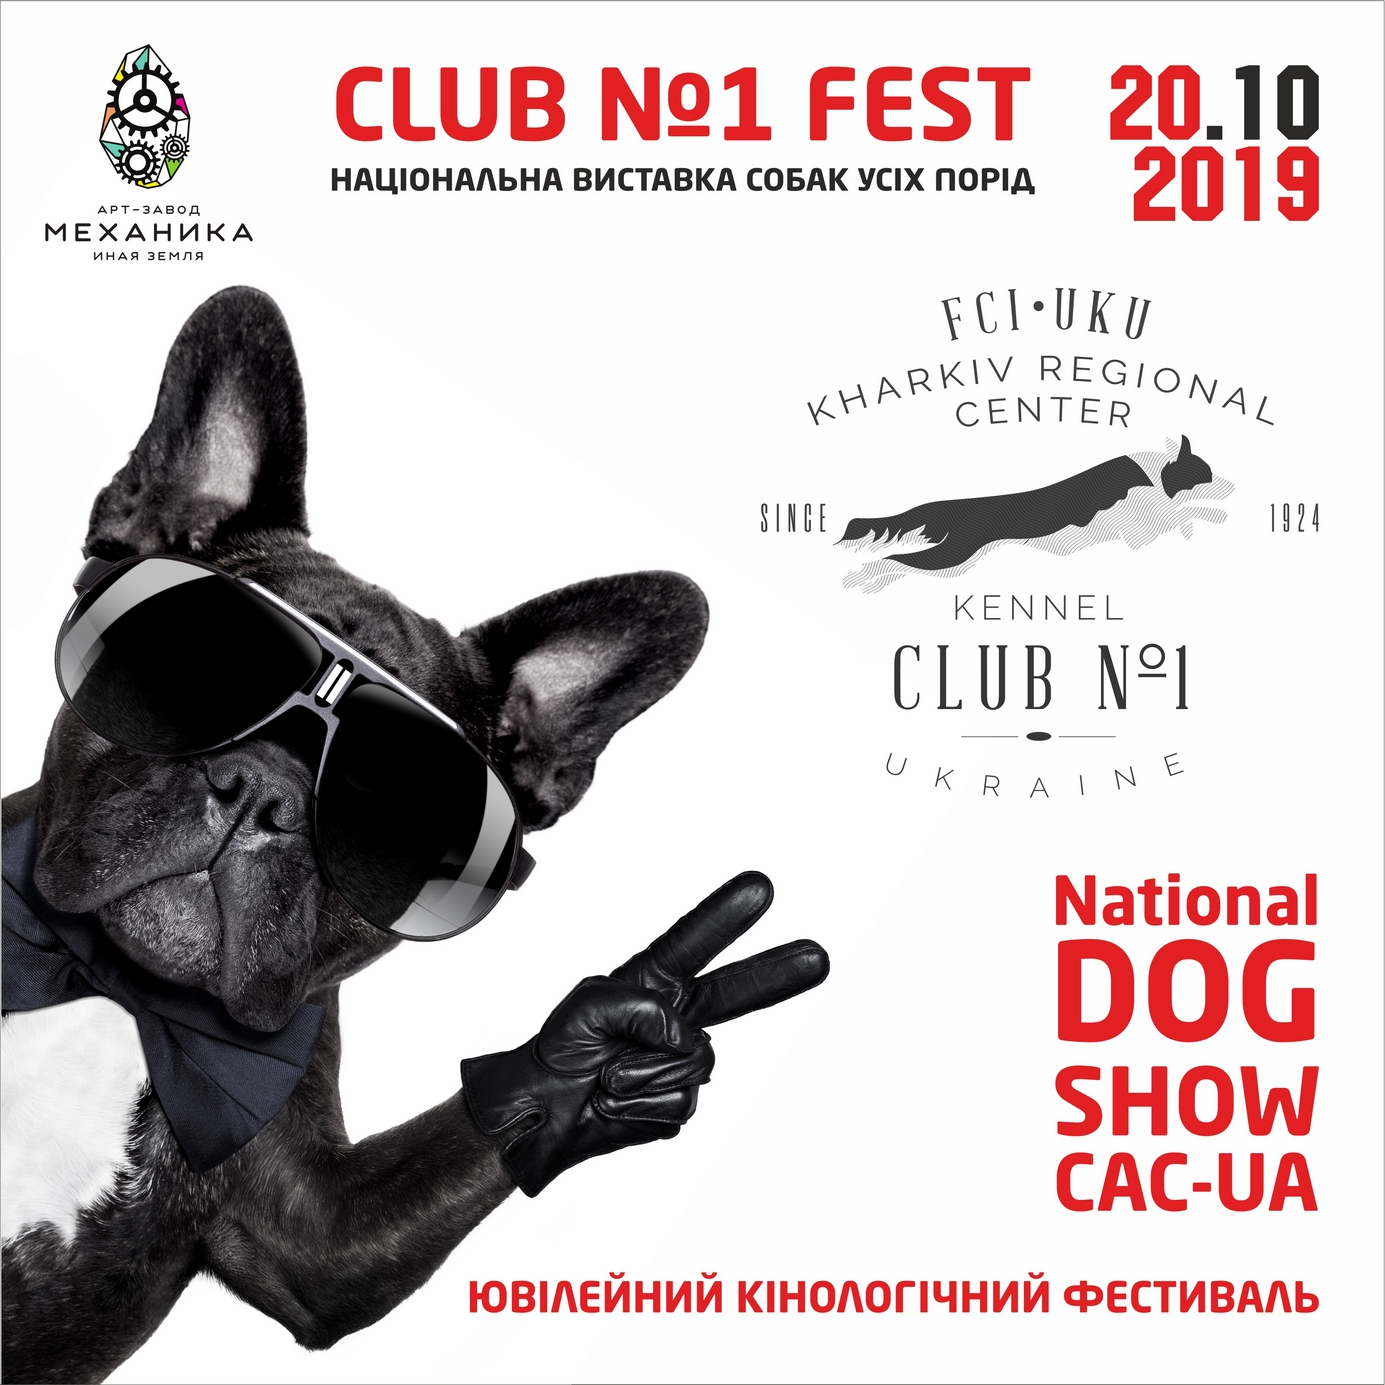 Club№1 Fest Національна Виставка Собак CAC-UA